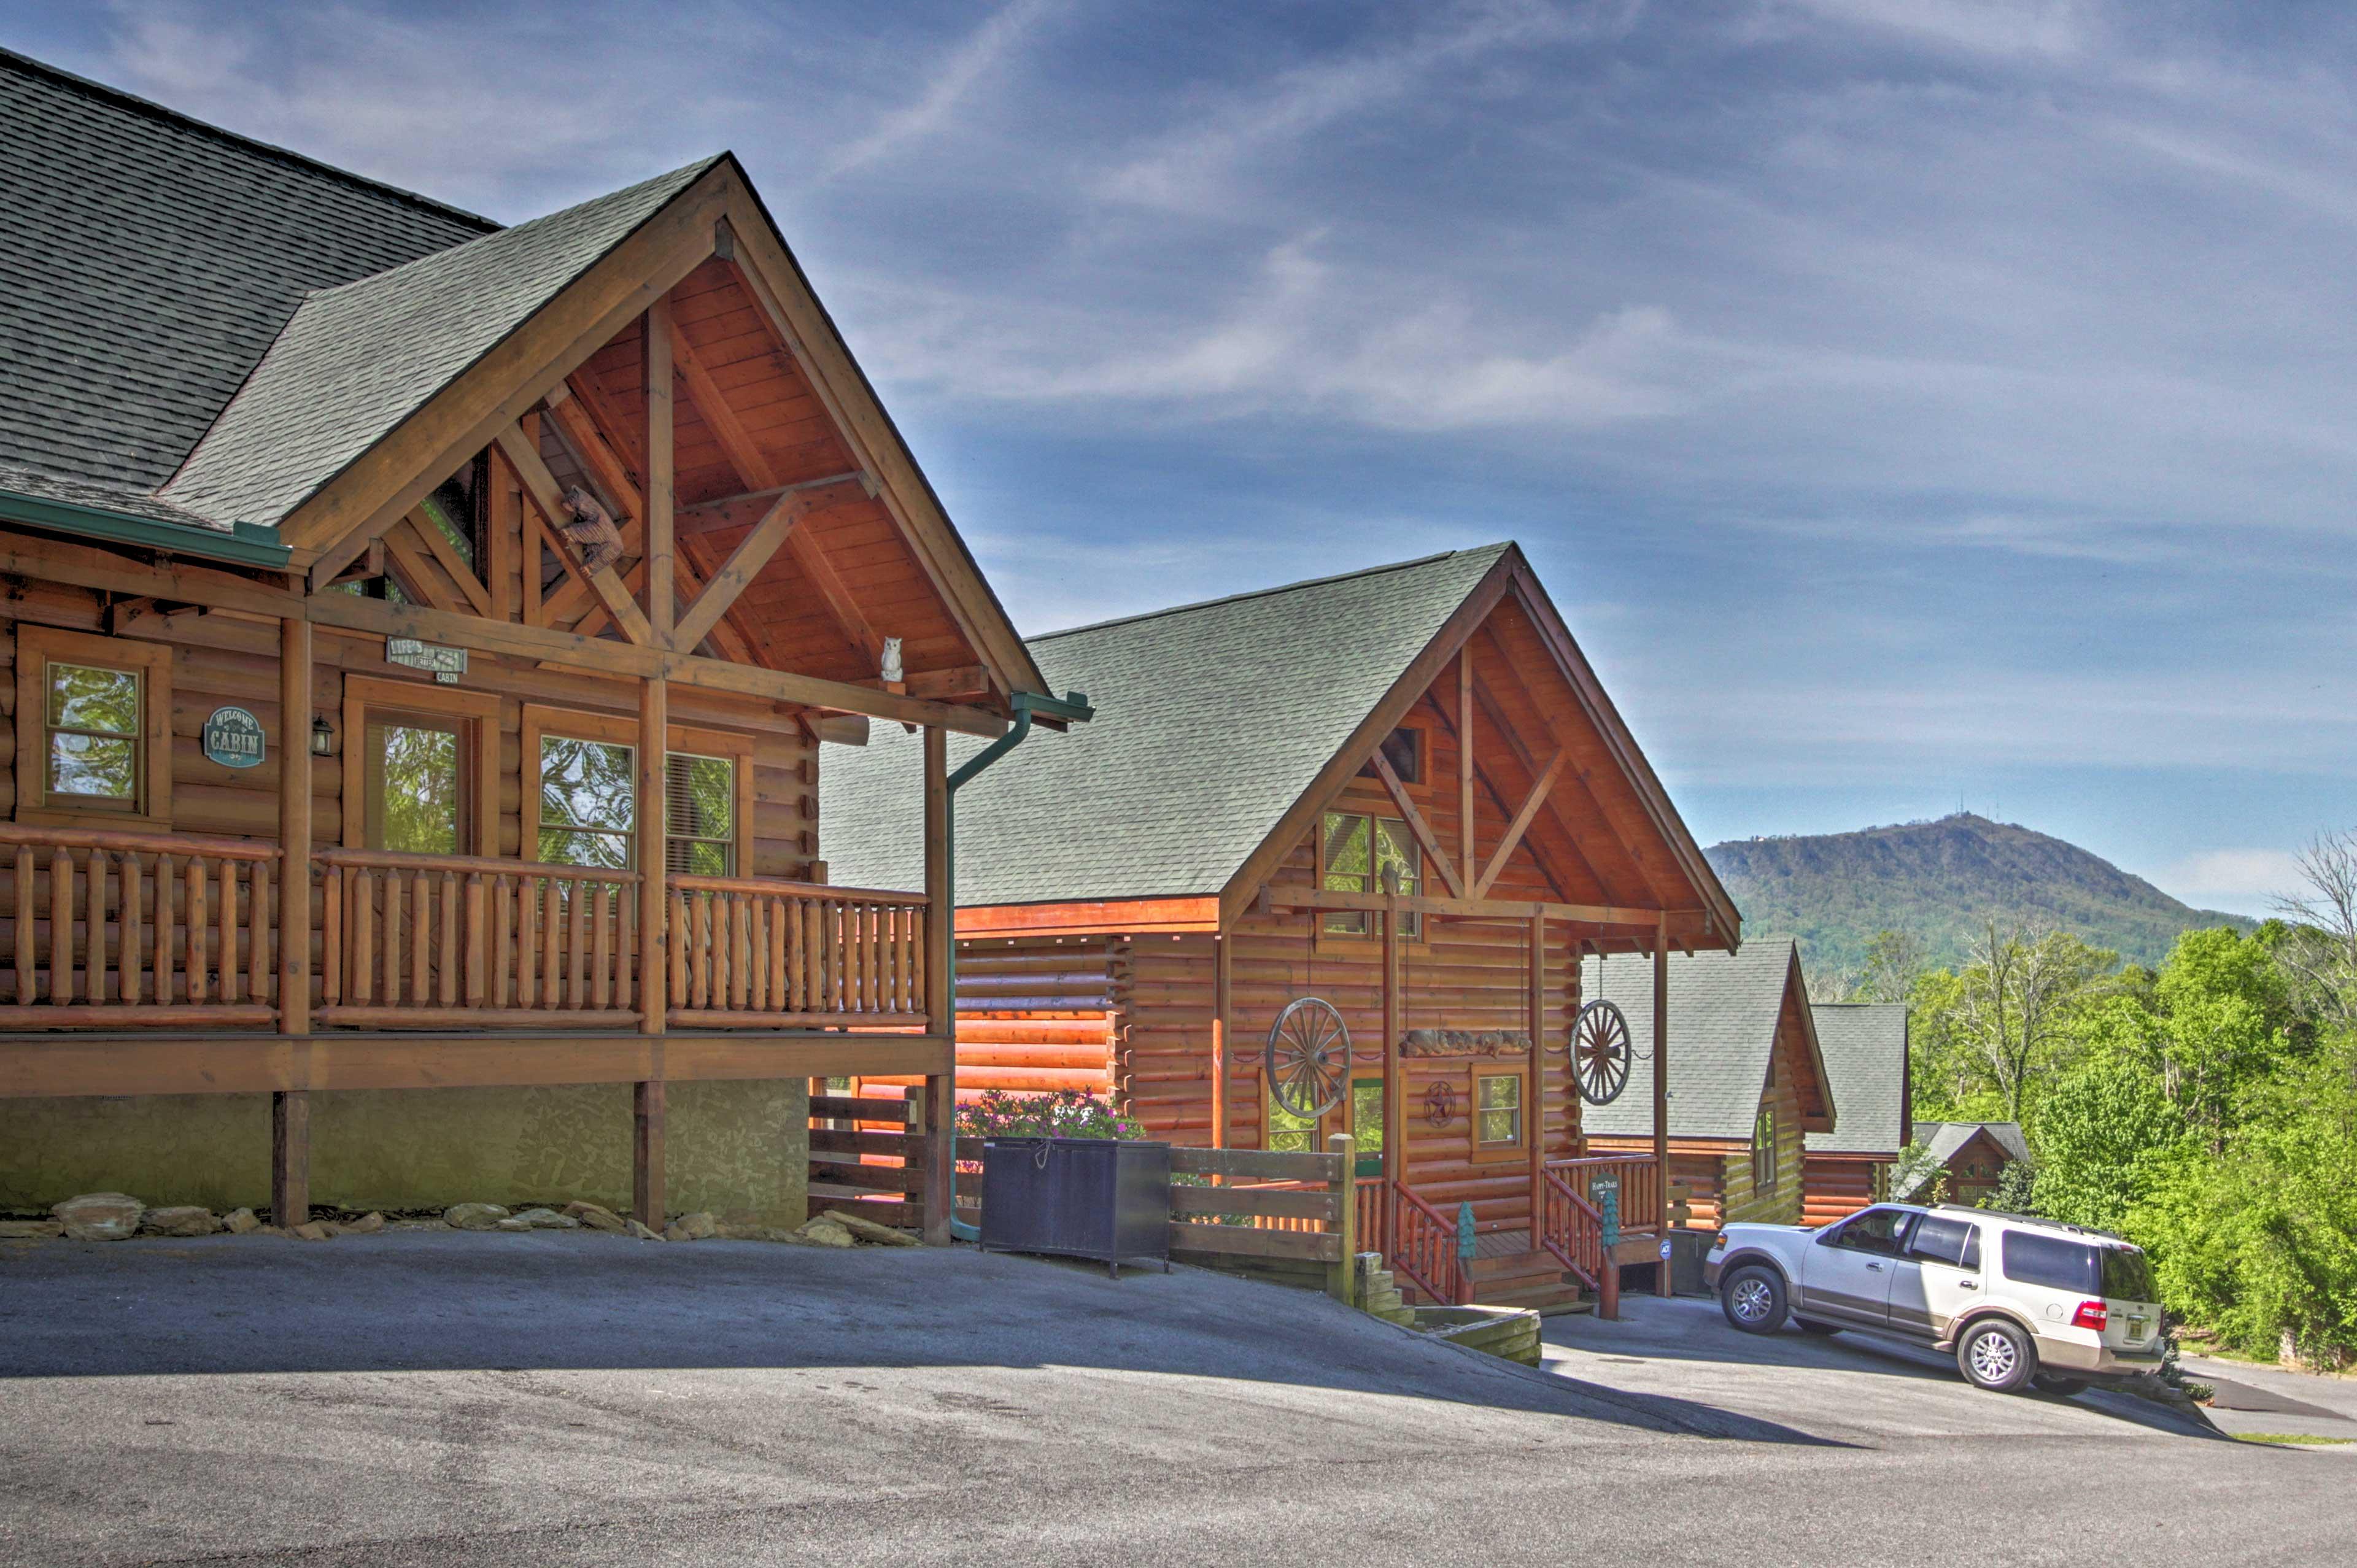 Cabin Exterior   Driveway Parking (3 Vehicles)